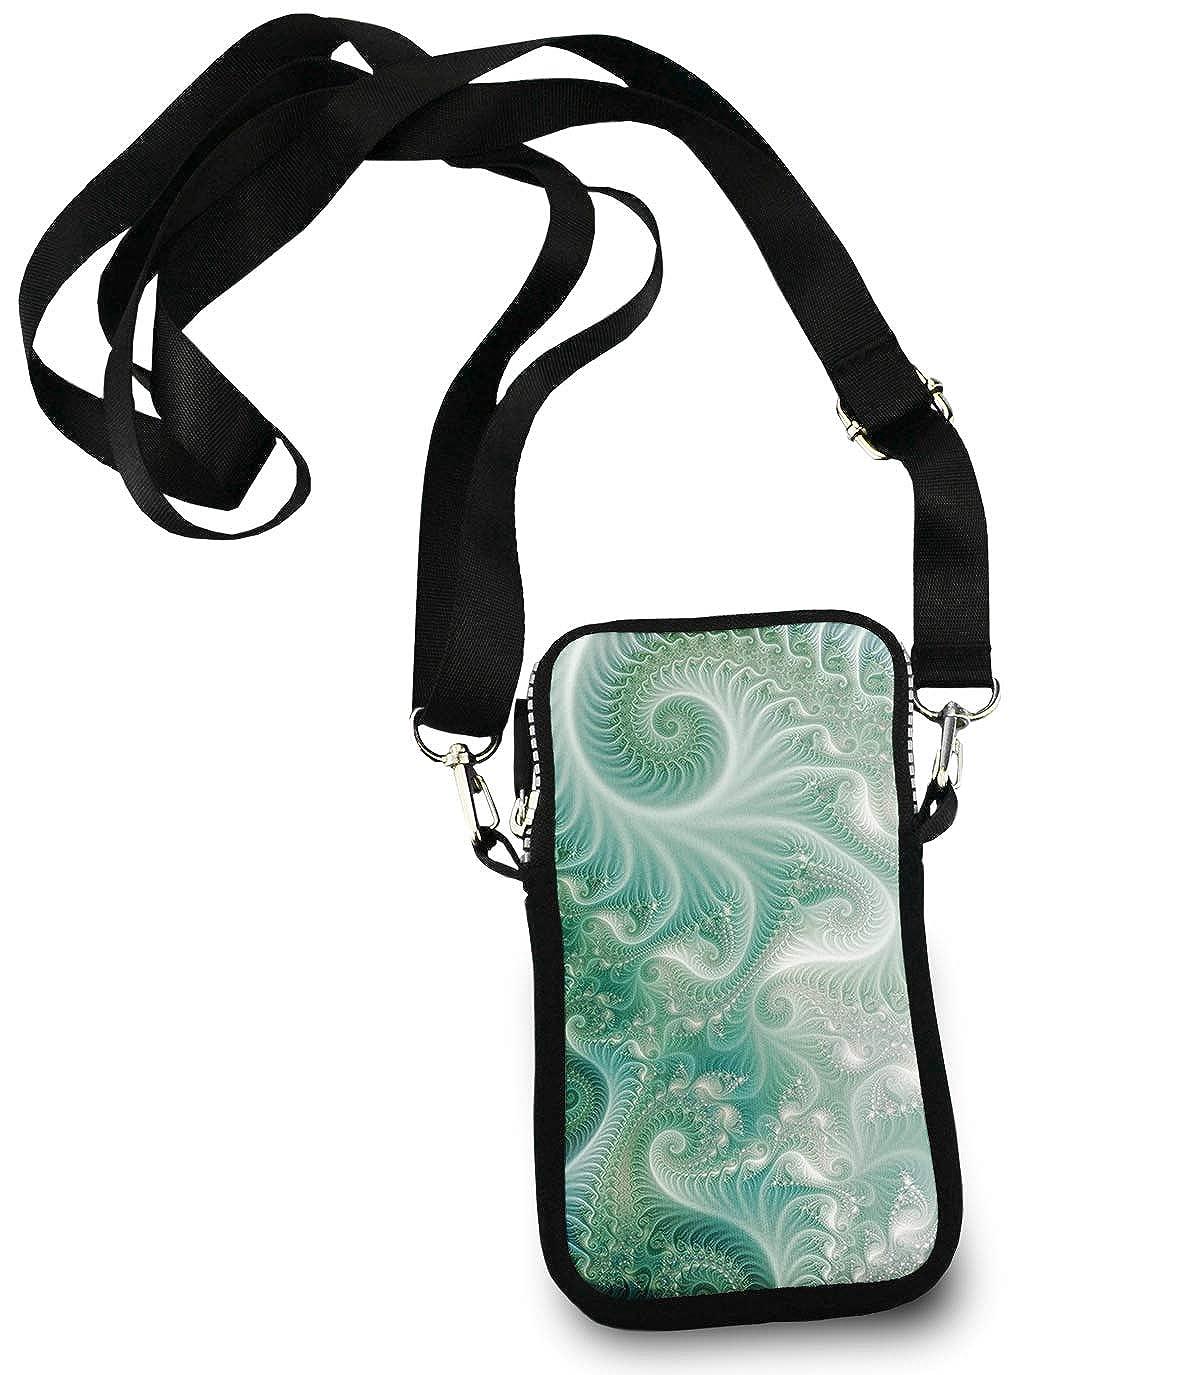 Cell Phone Purse Mini Crossbody Bag Smartphone Wallet Headphone Bag Green Octopus underwater